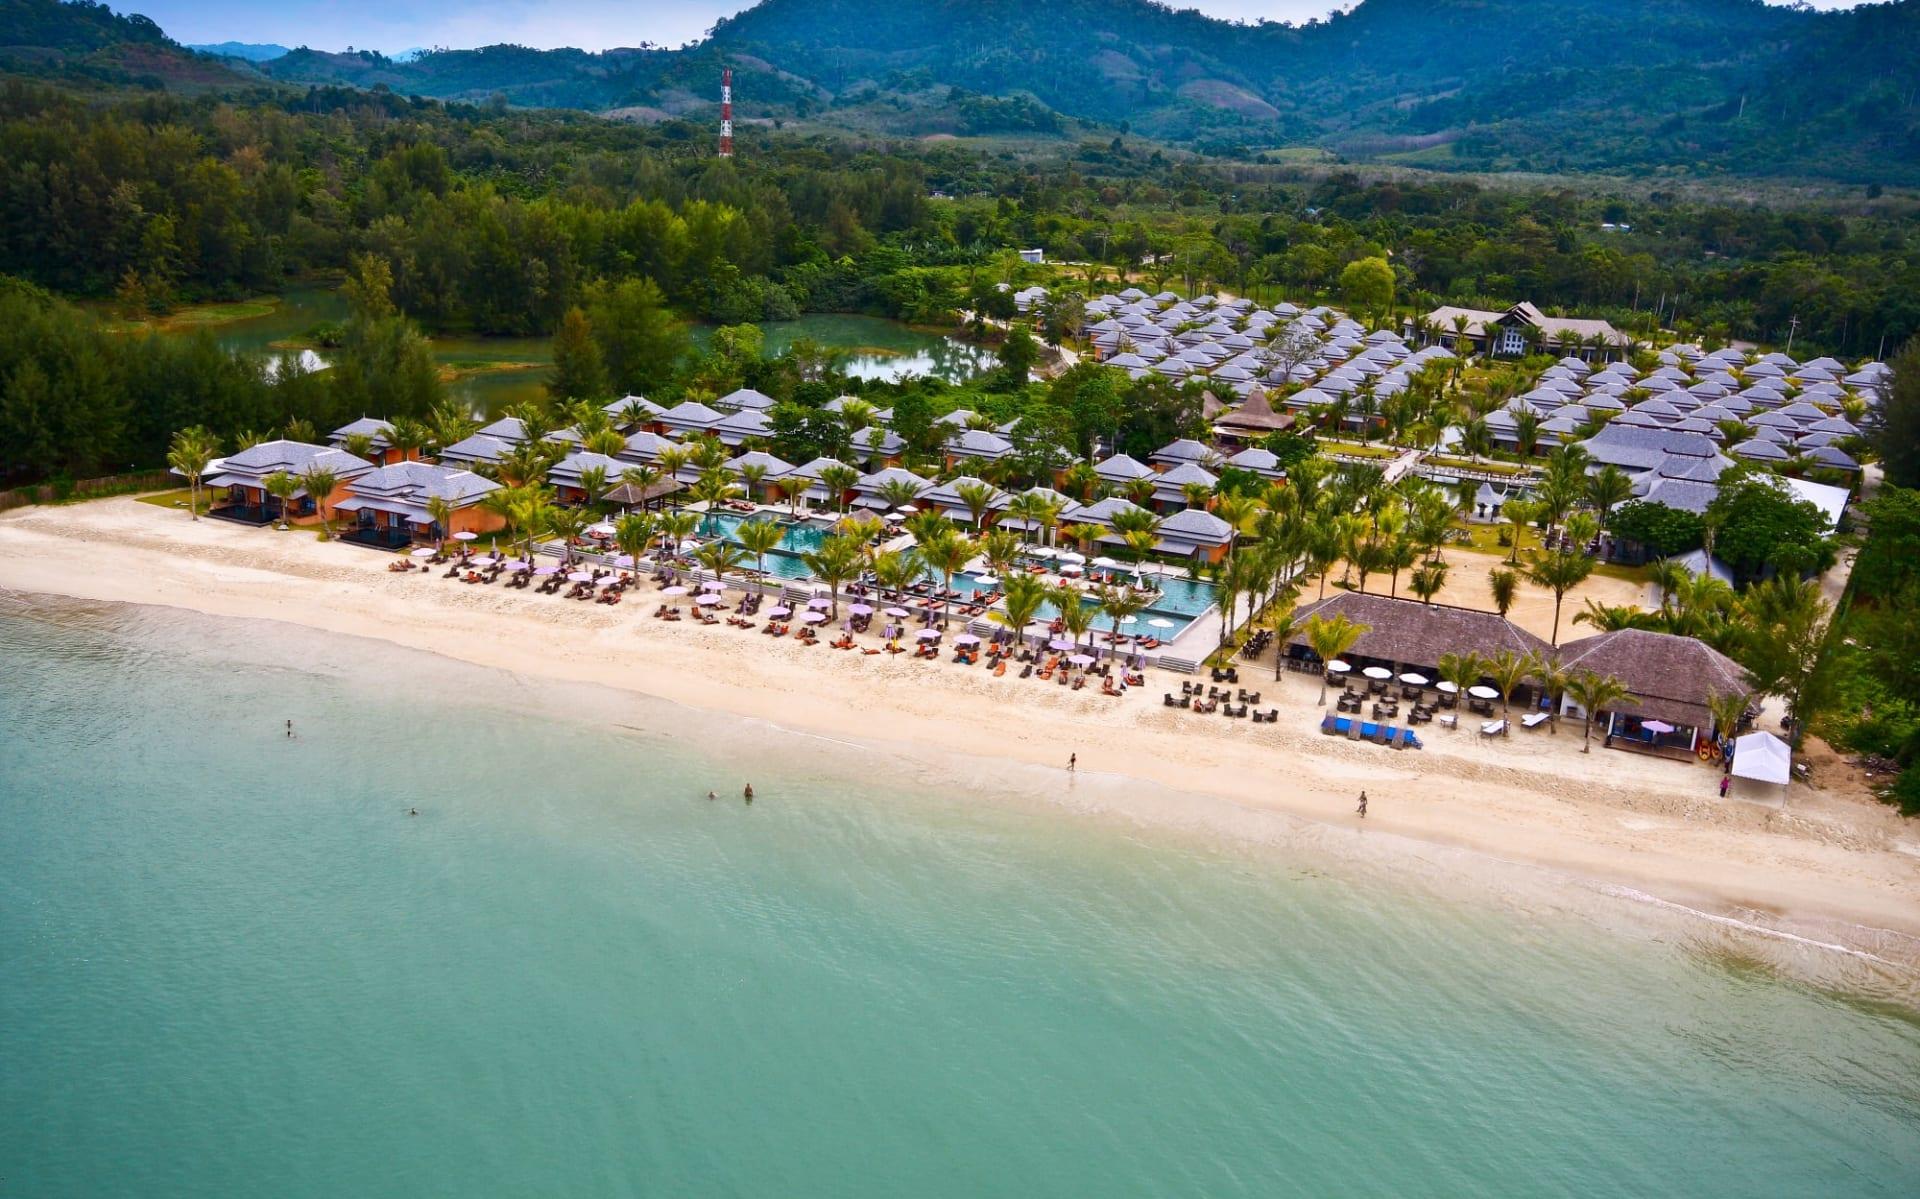 Beyond Resort Khaolak in Khao Lak: Hotel Overview